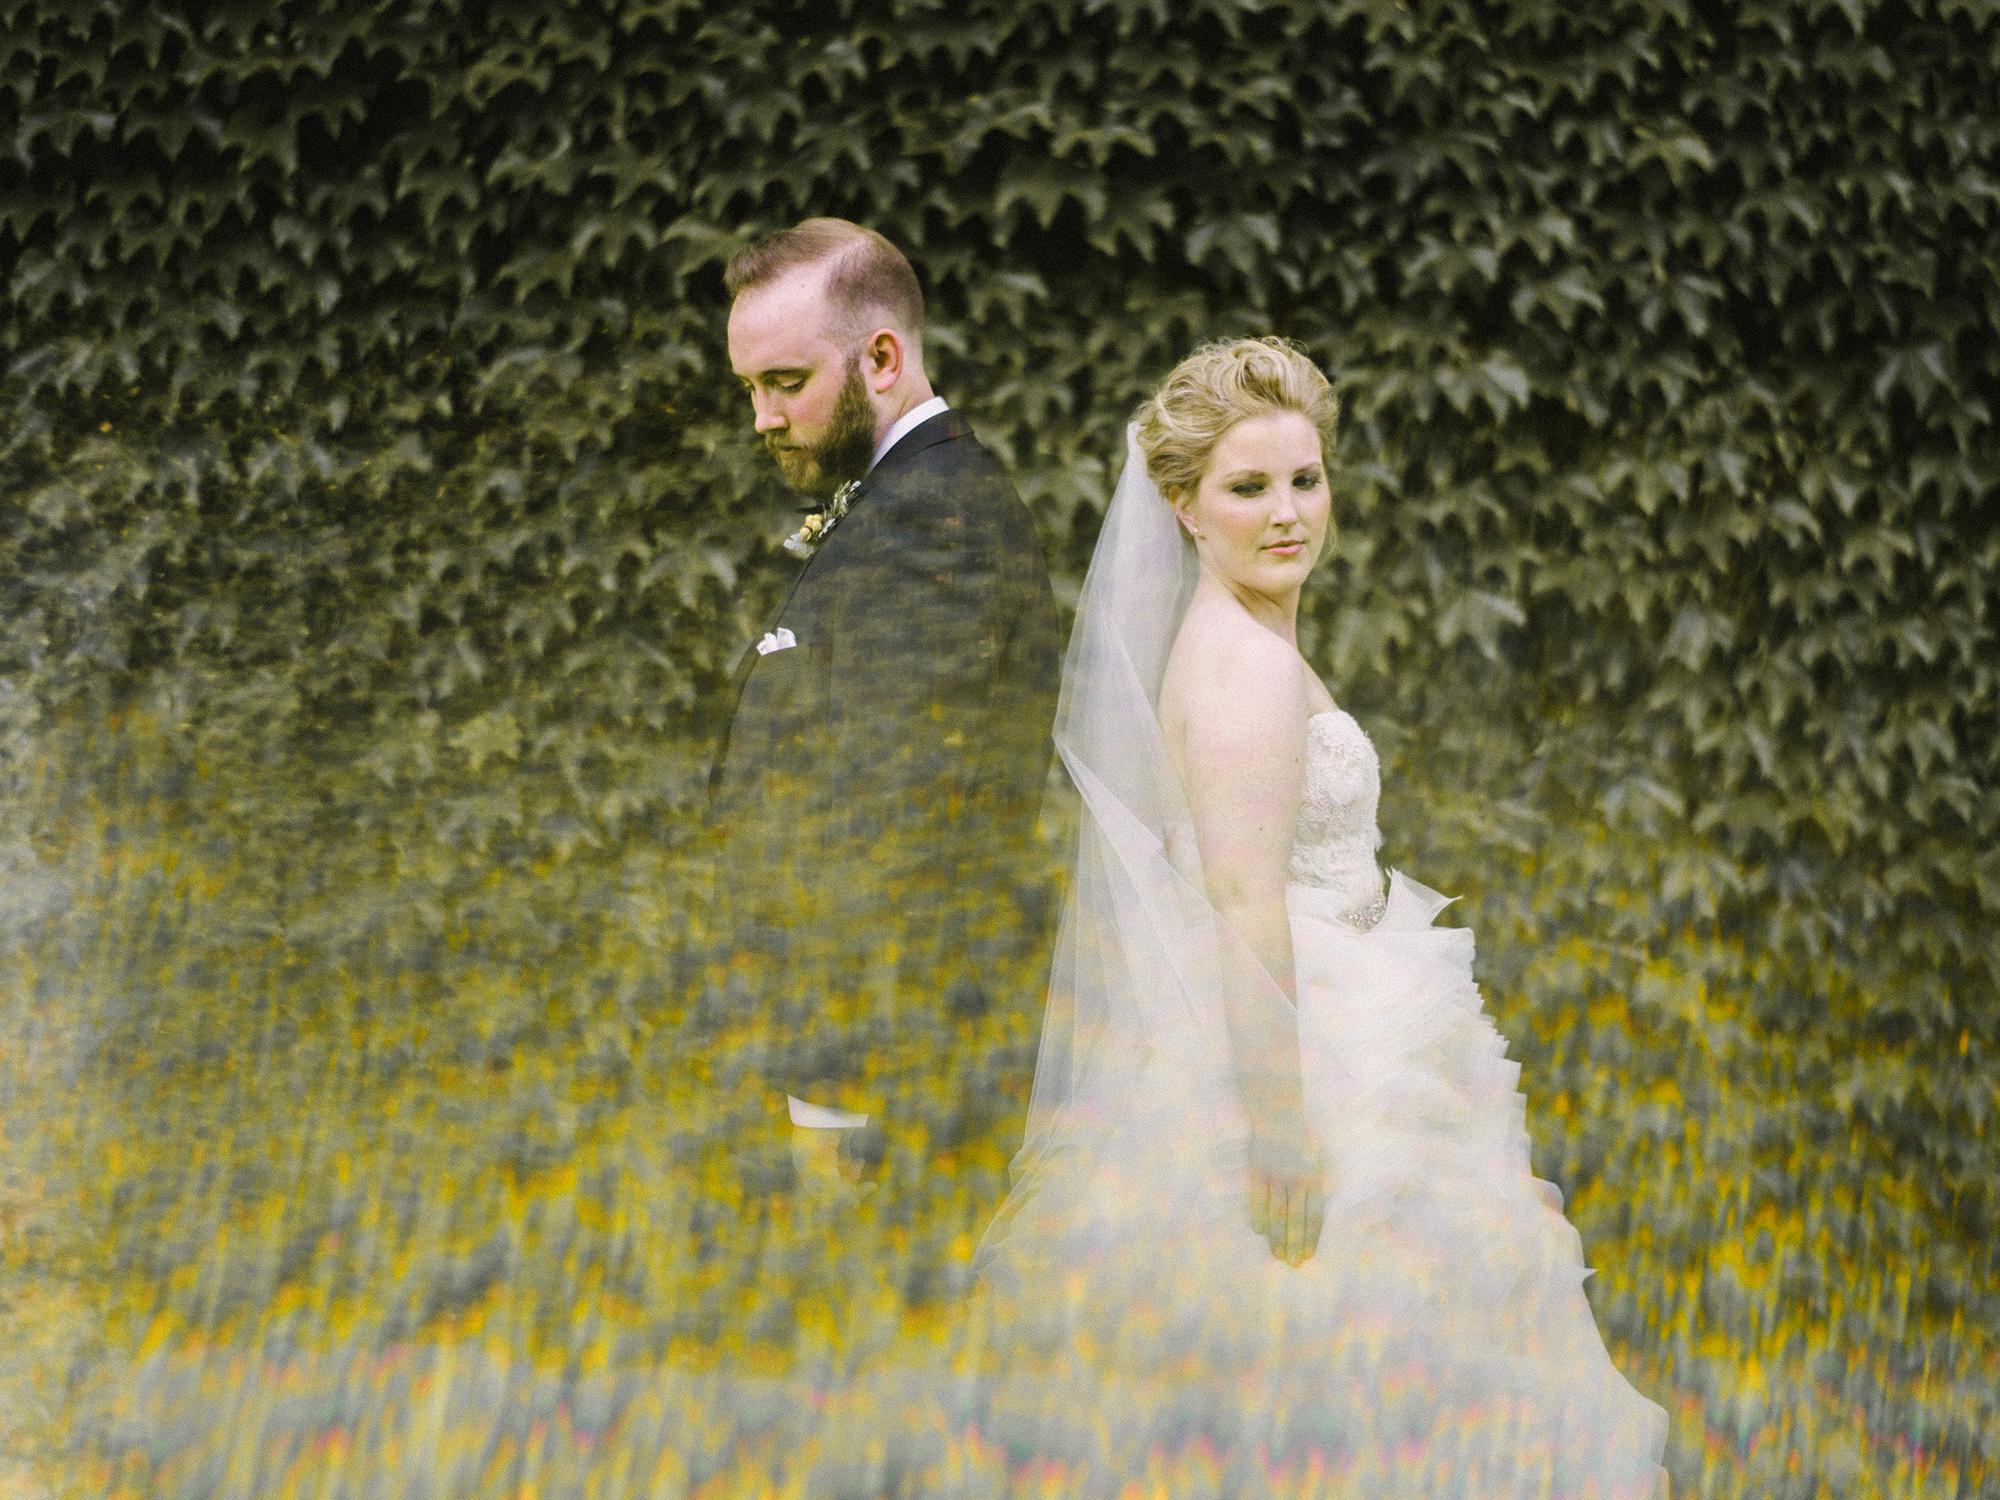 Will & Andrea Becker's Wedding Photographs